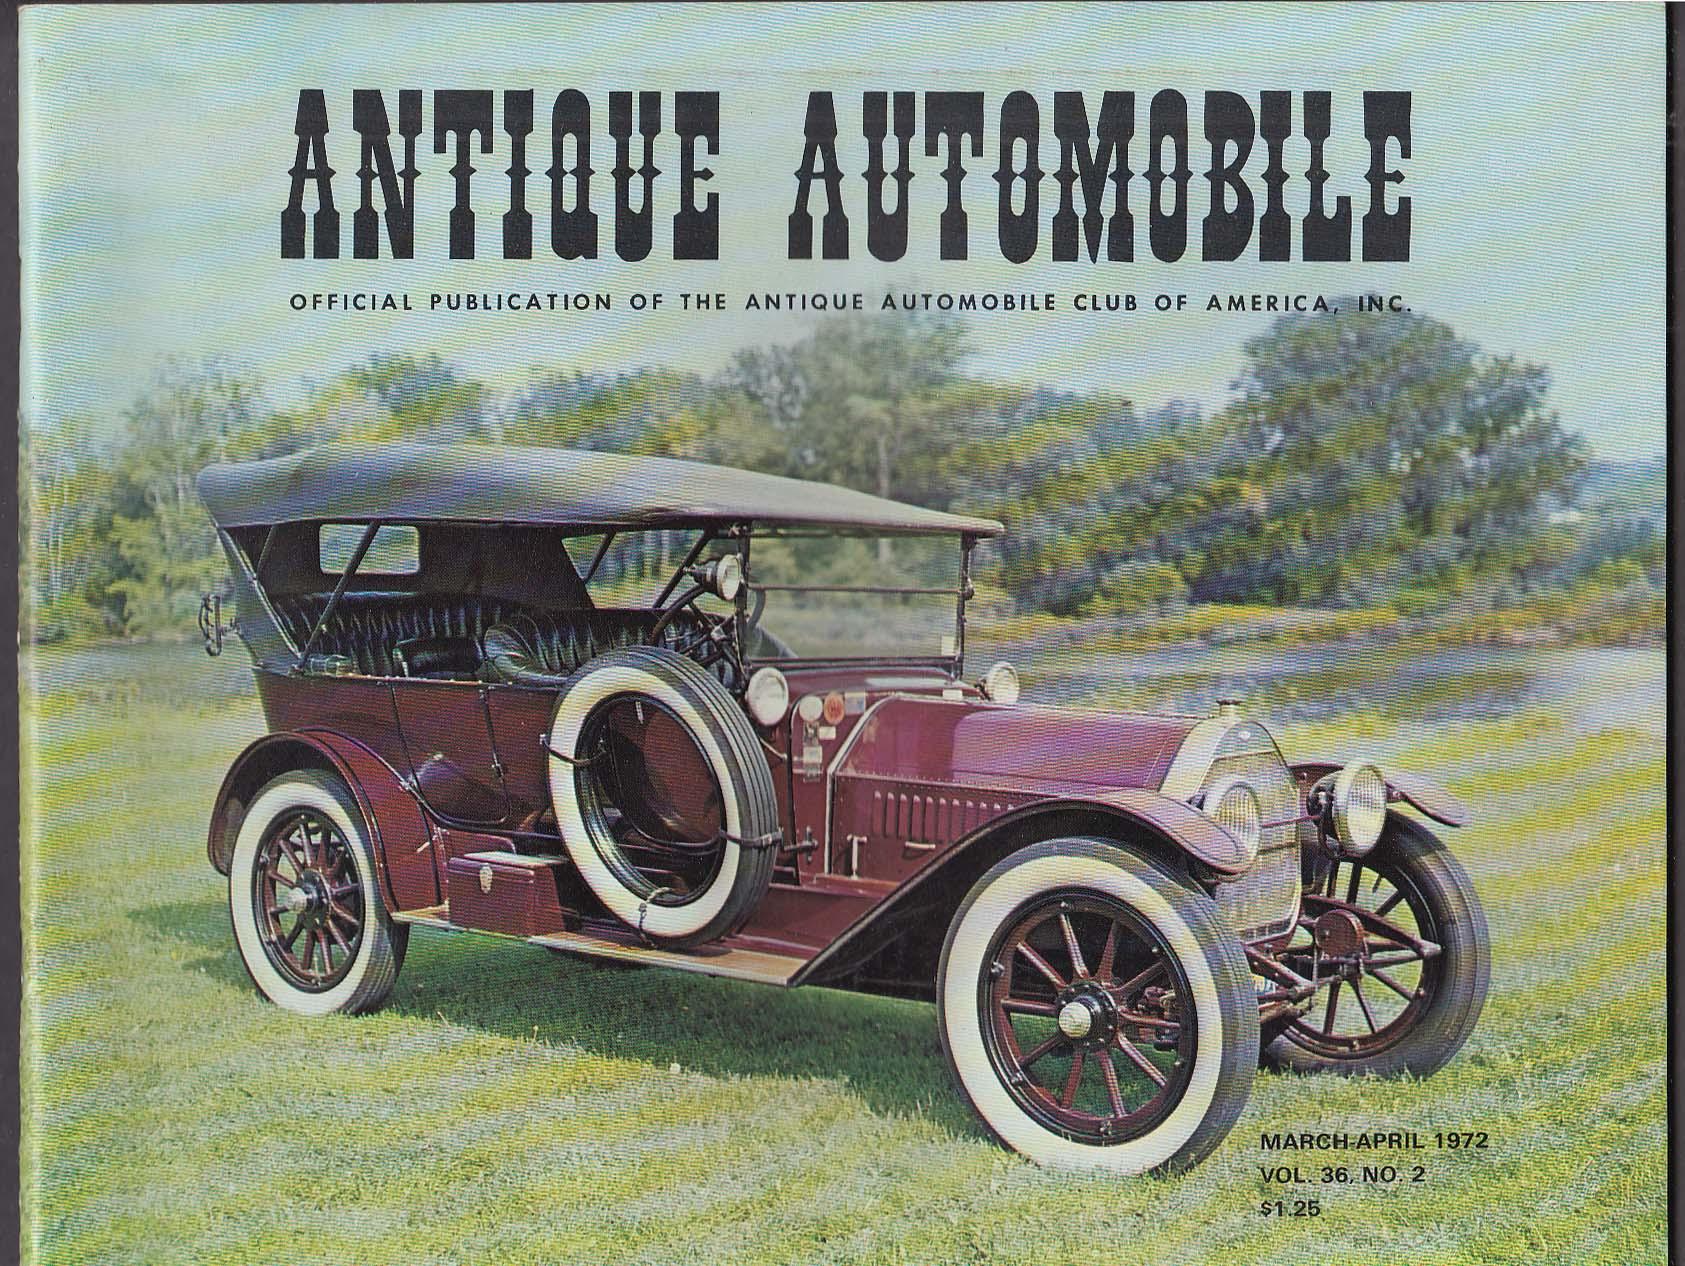 ANTIQUE AUTOMOBILE Chrysler Six 1913 Moyer DeVaux Sintz Ostrava + 3-4 1972